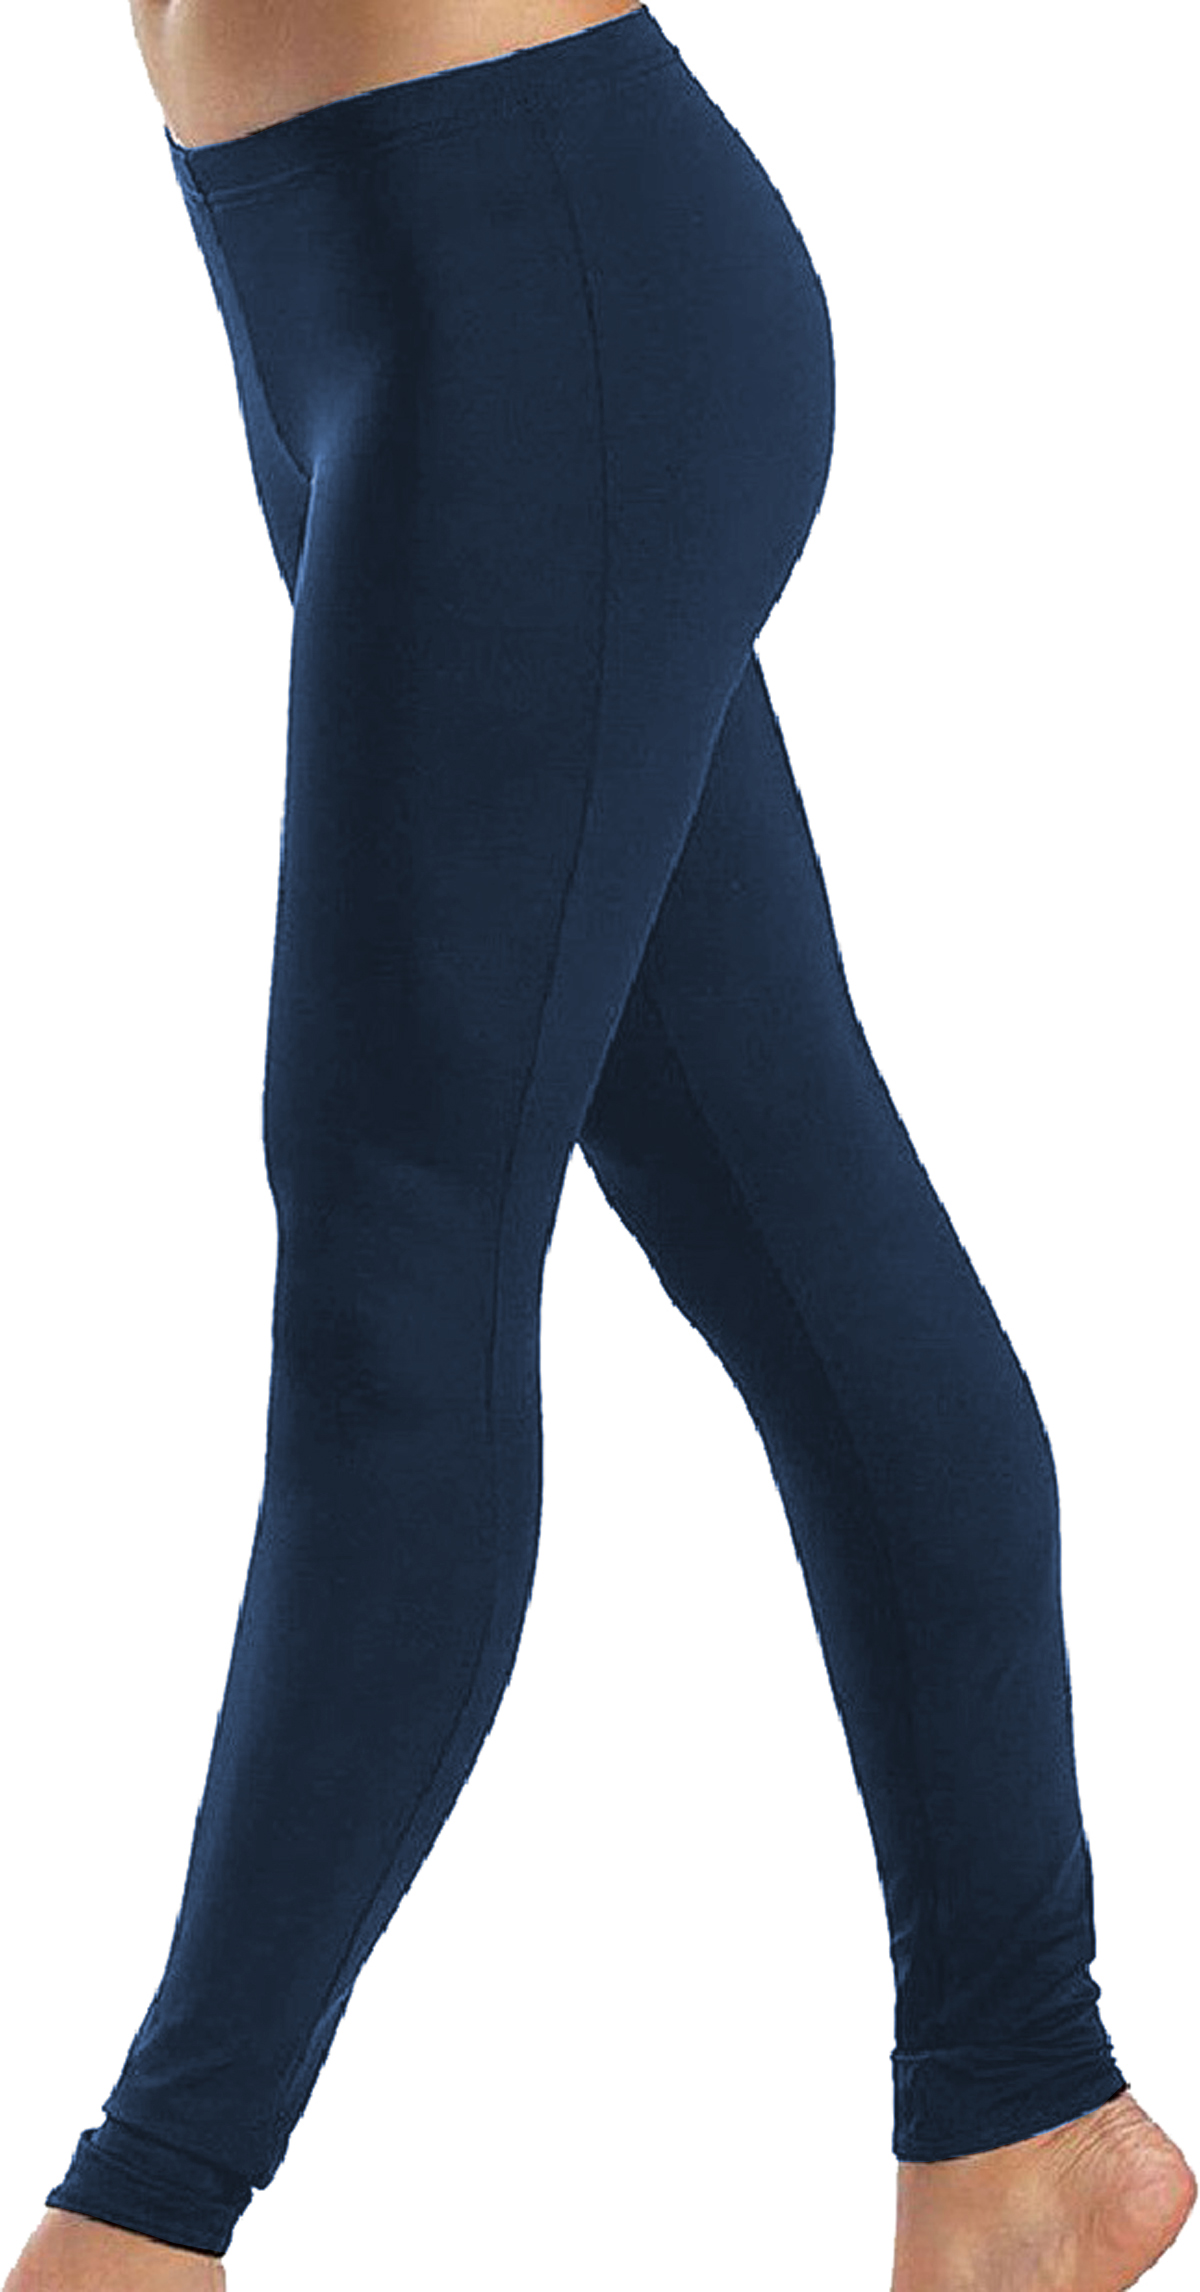 d9b0810fcd319 School Uniform Girls/Ladies Lycra Leggings Sports PE Pants Only ...